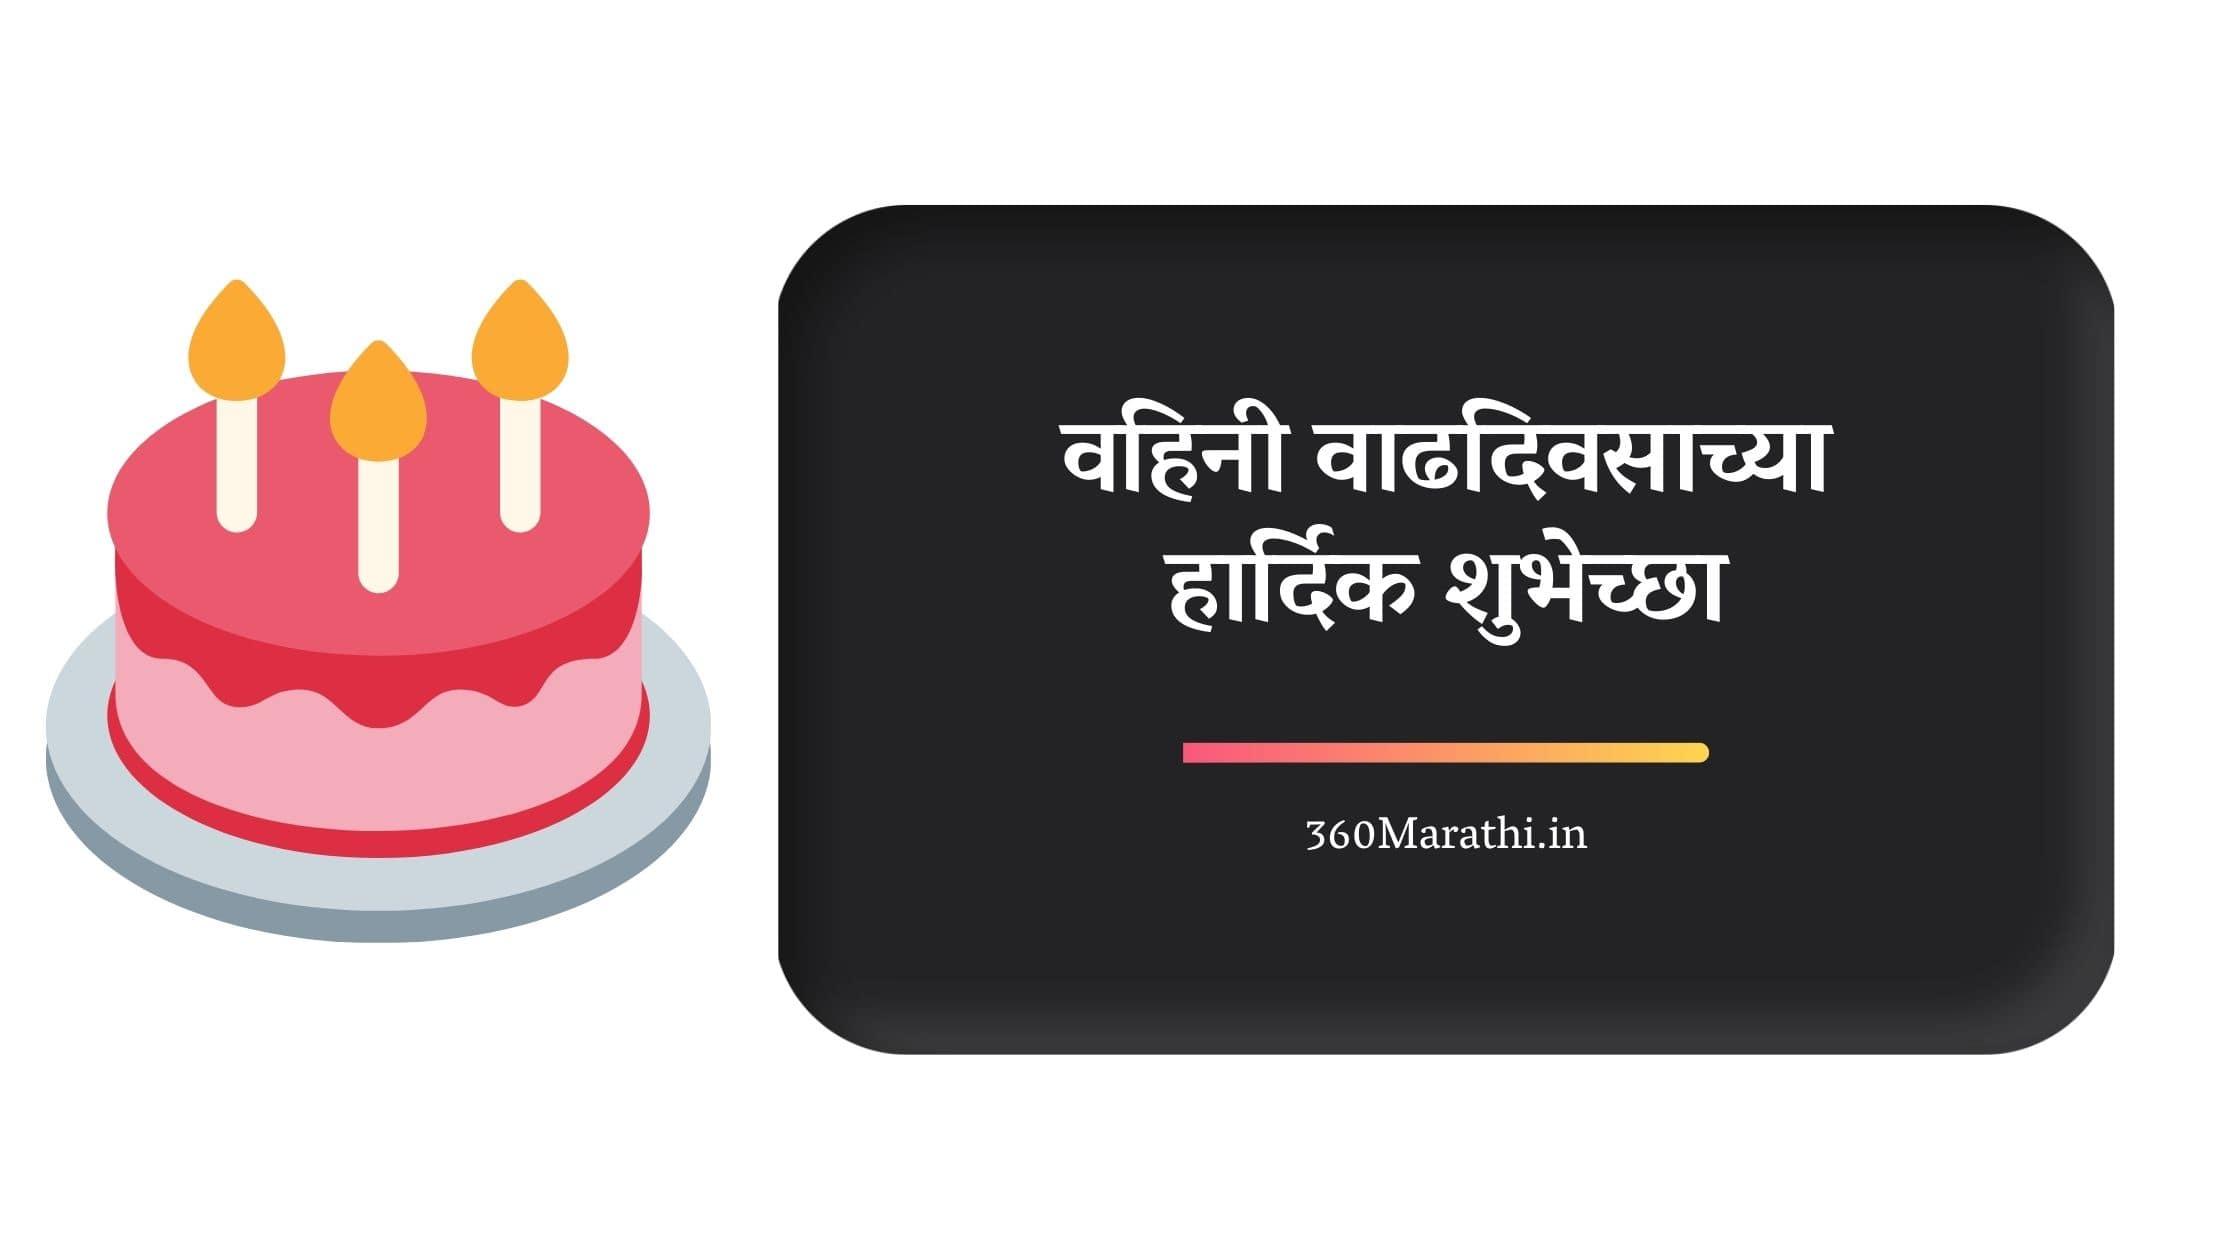 Birthday Wishes in Marathi For Vahini | वहिनी वाढदिवसाच्या हार्दिक शुभेच्छा